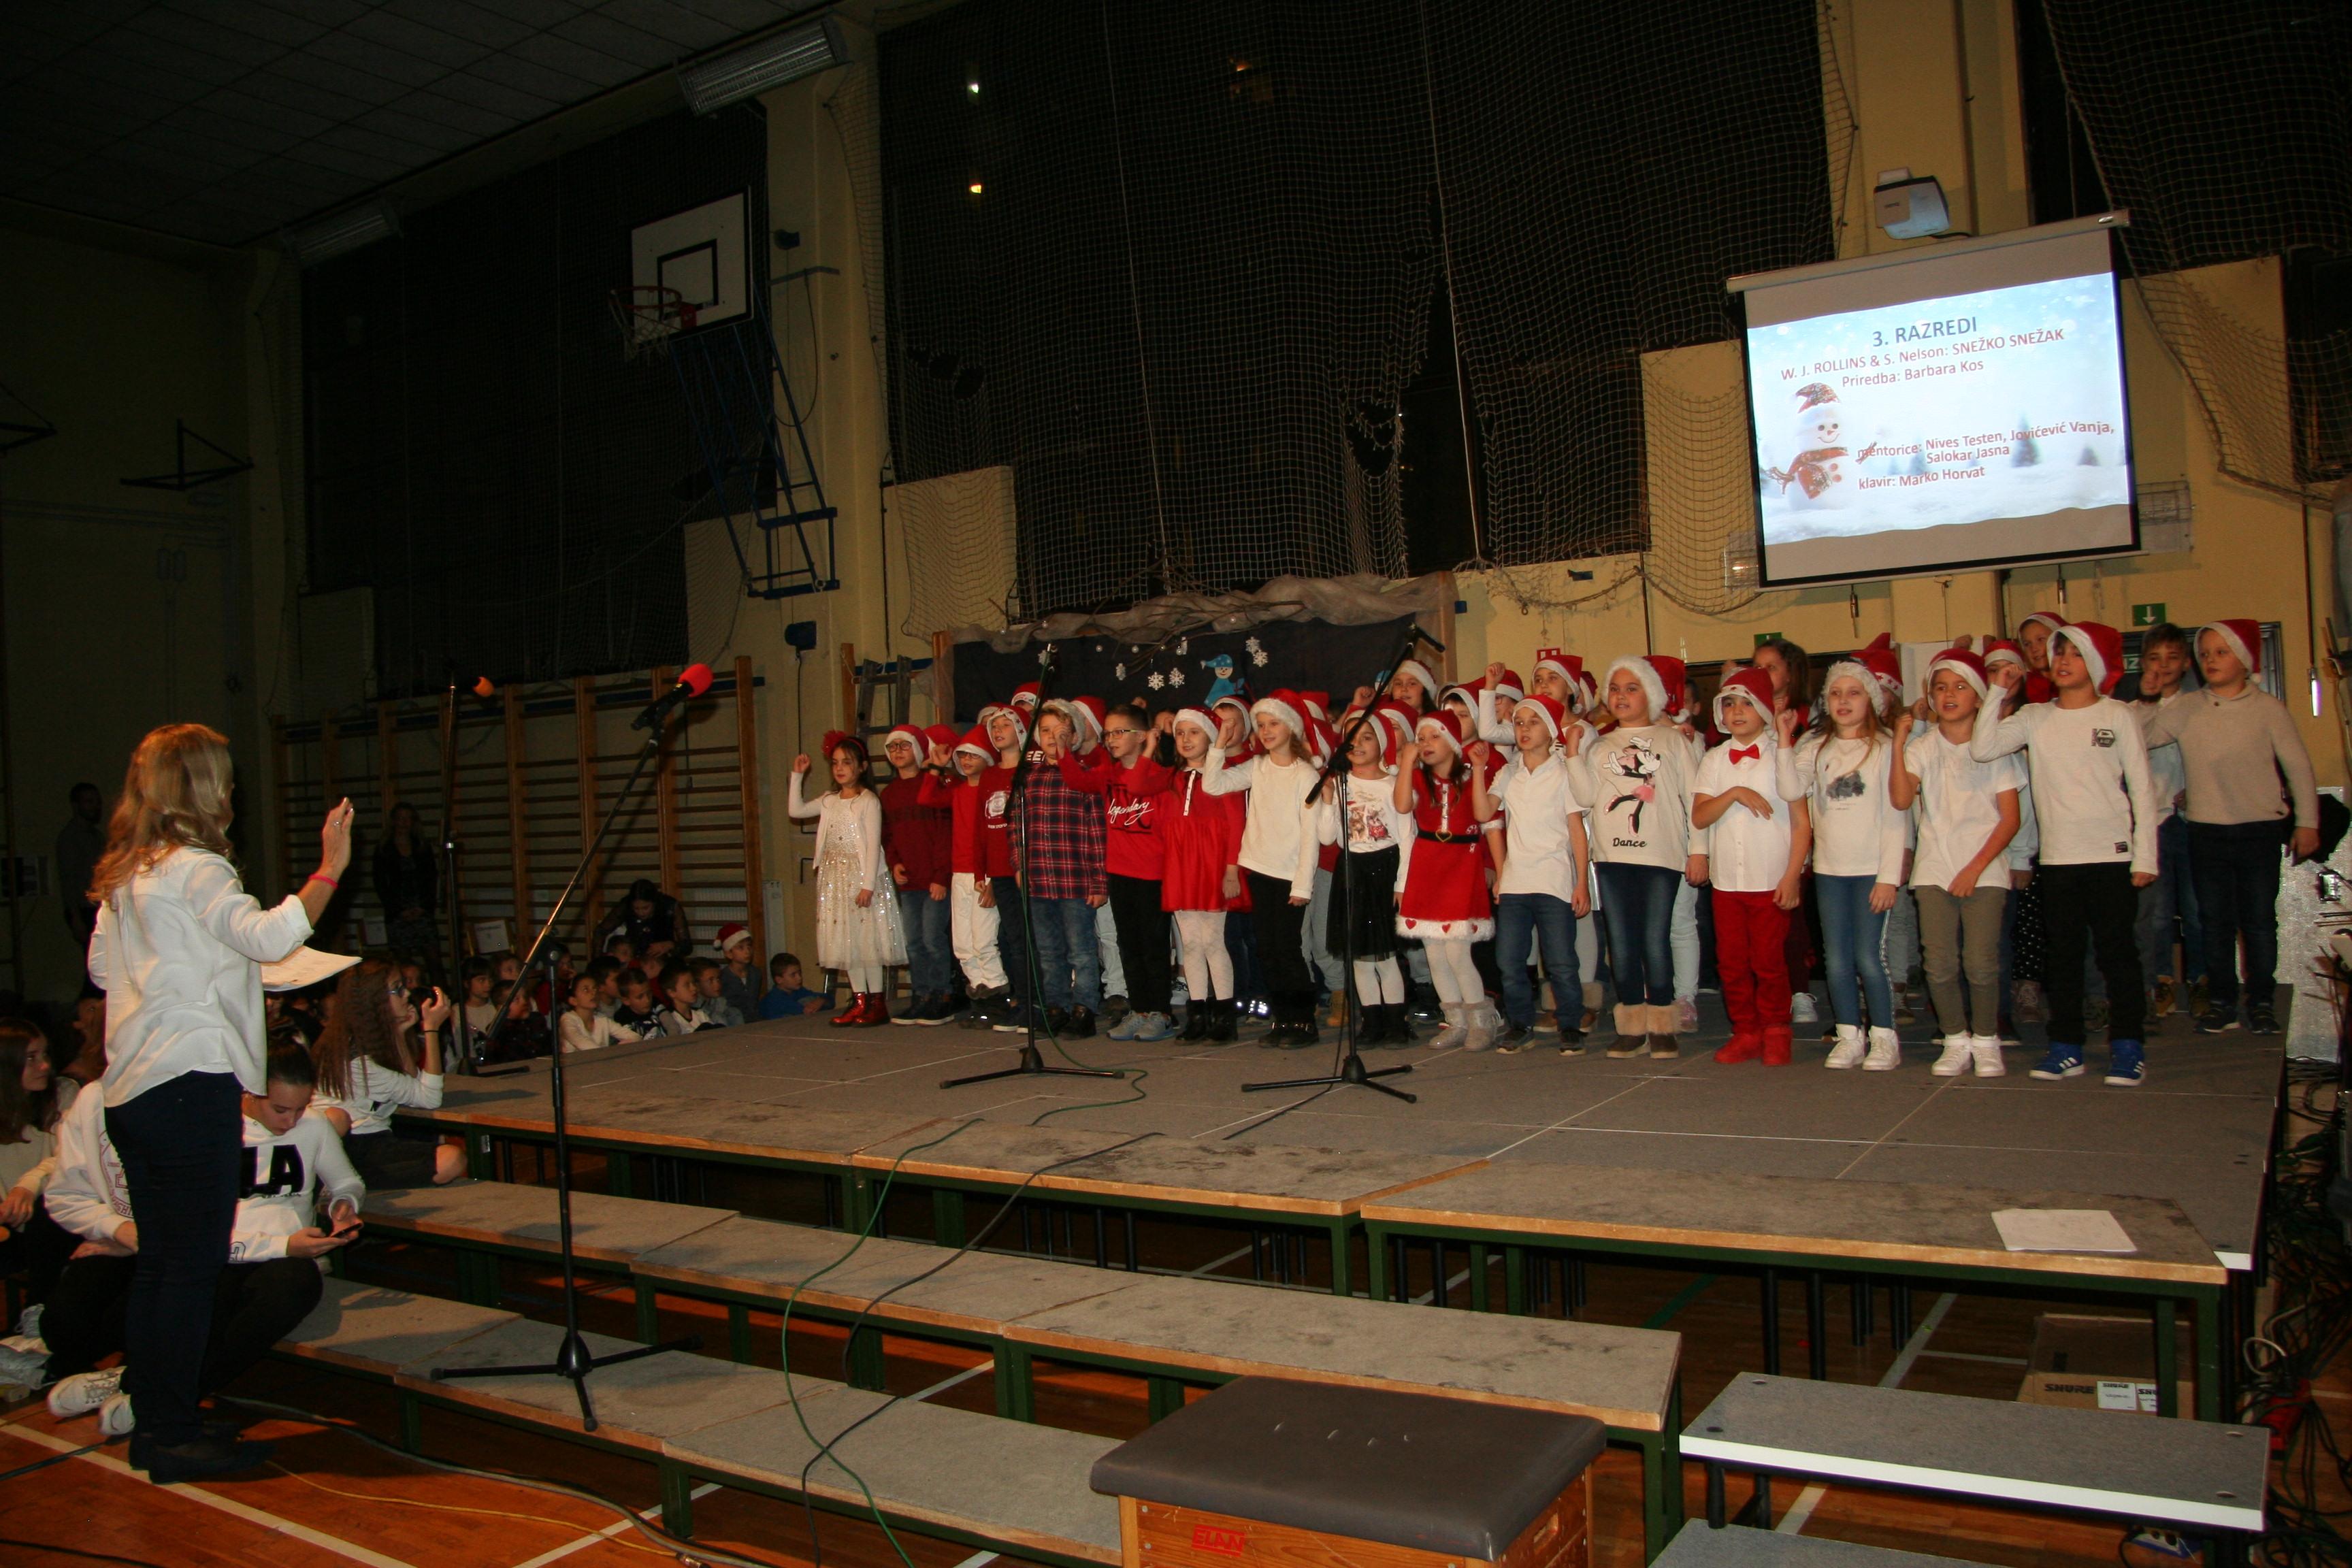 novoletno_humanitarni-koncert-2019-072